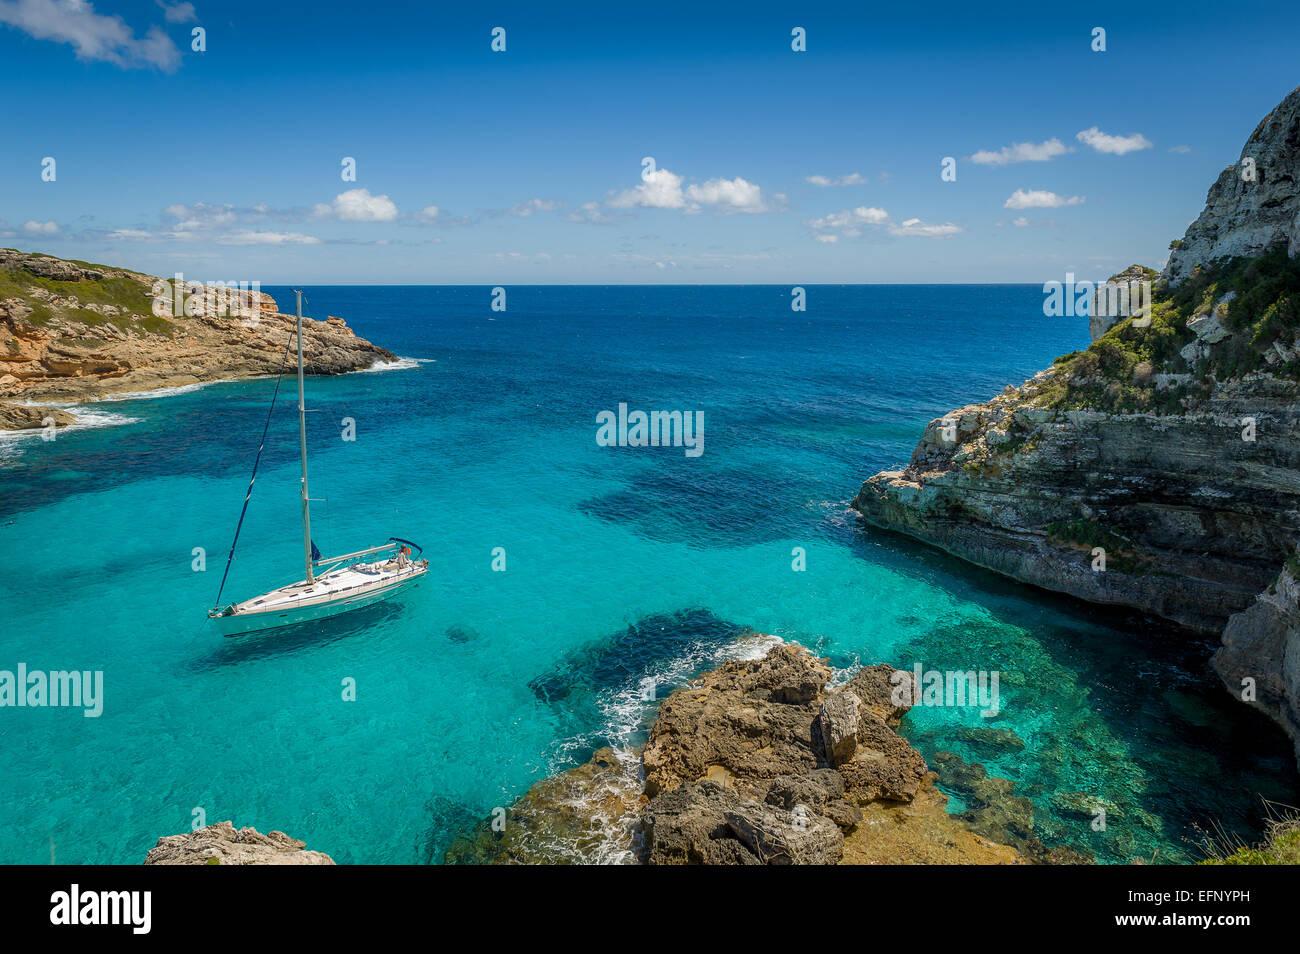 Dreamy bay seascape - Stock Image